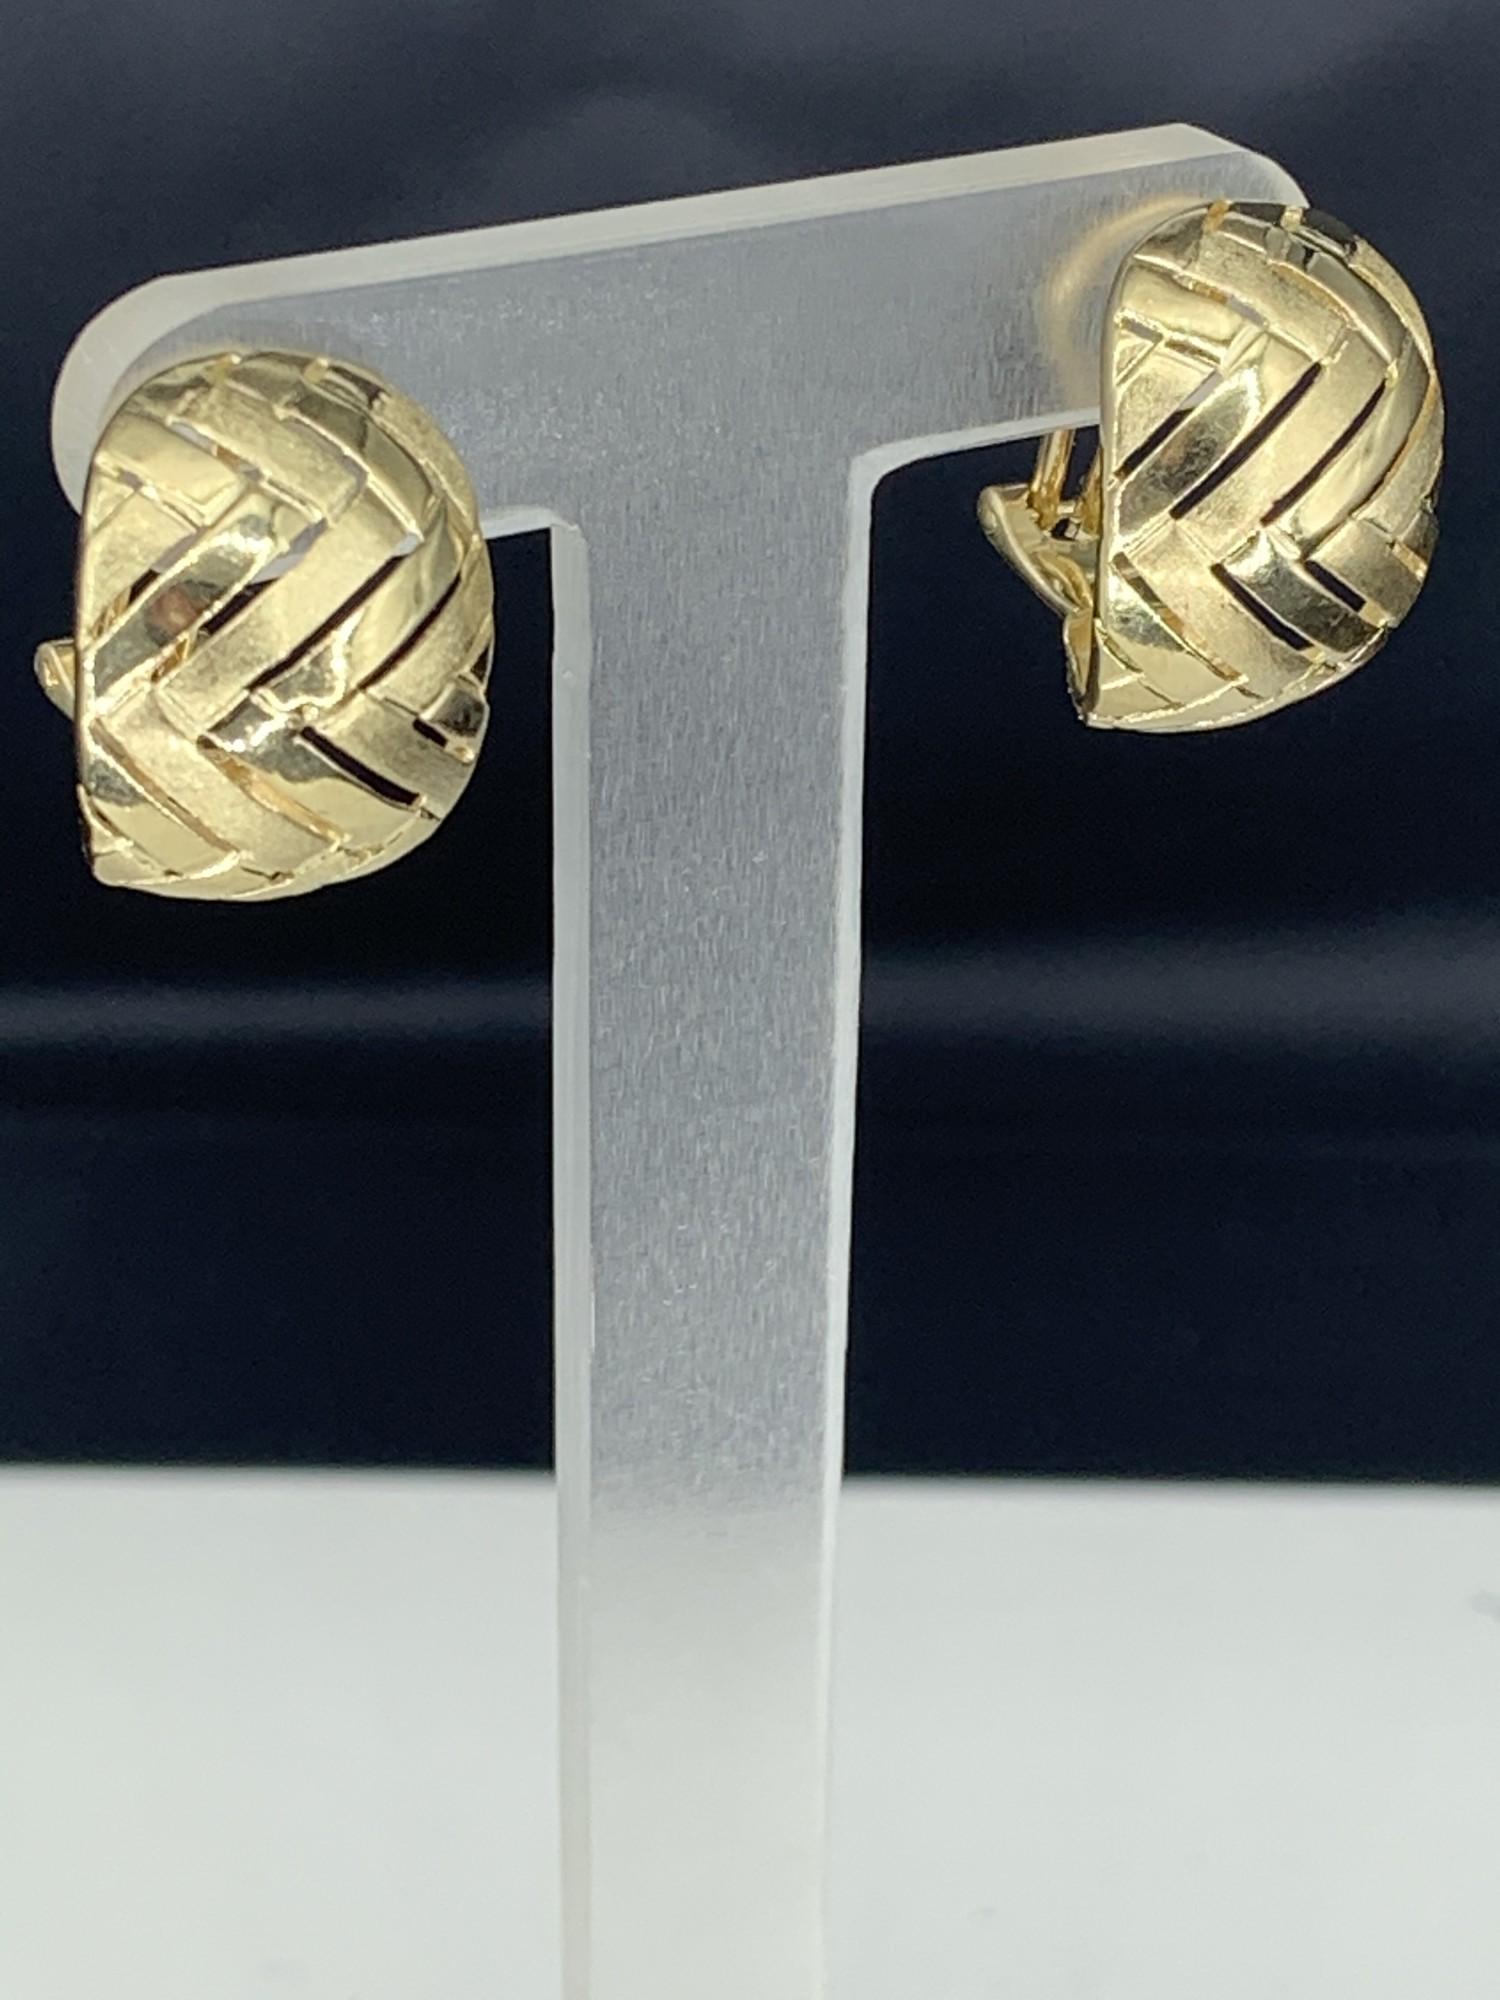 Chevron Design Hoop Earrings with Clip Post Backs<br /> 14 Karat Yellow Gold<br /> 14.5mm Wide